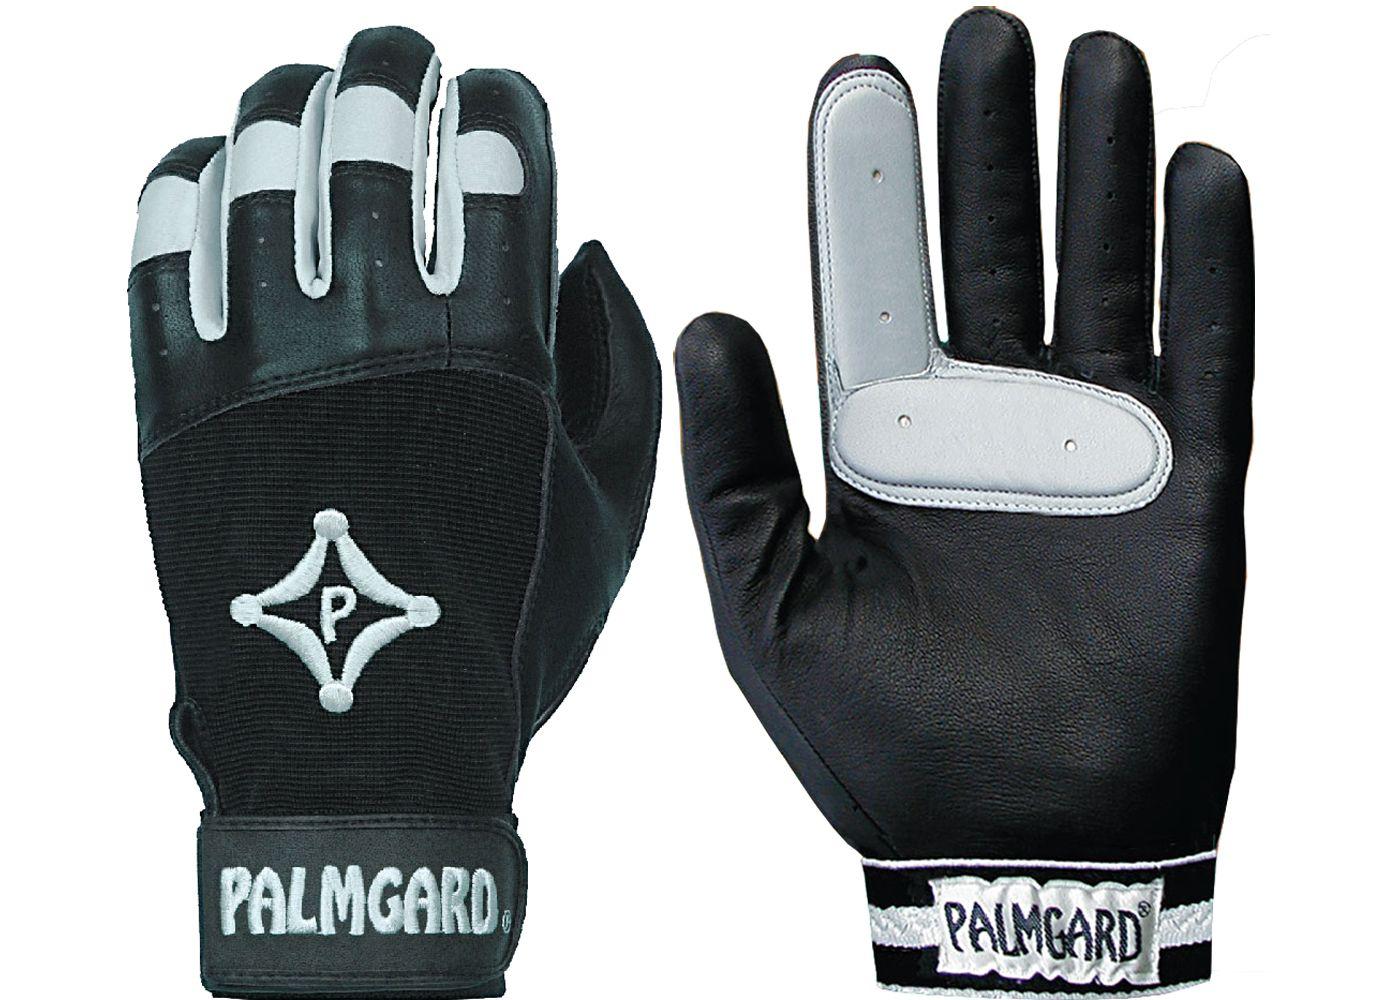 PALMGARD Adult Protective Inner Mitt Glove - Left Hand